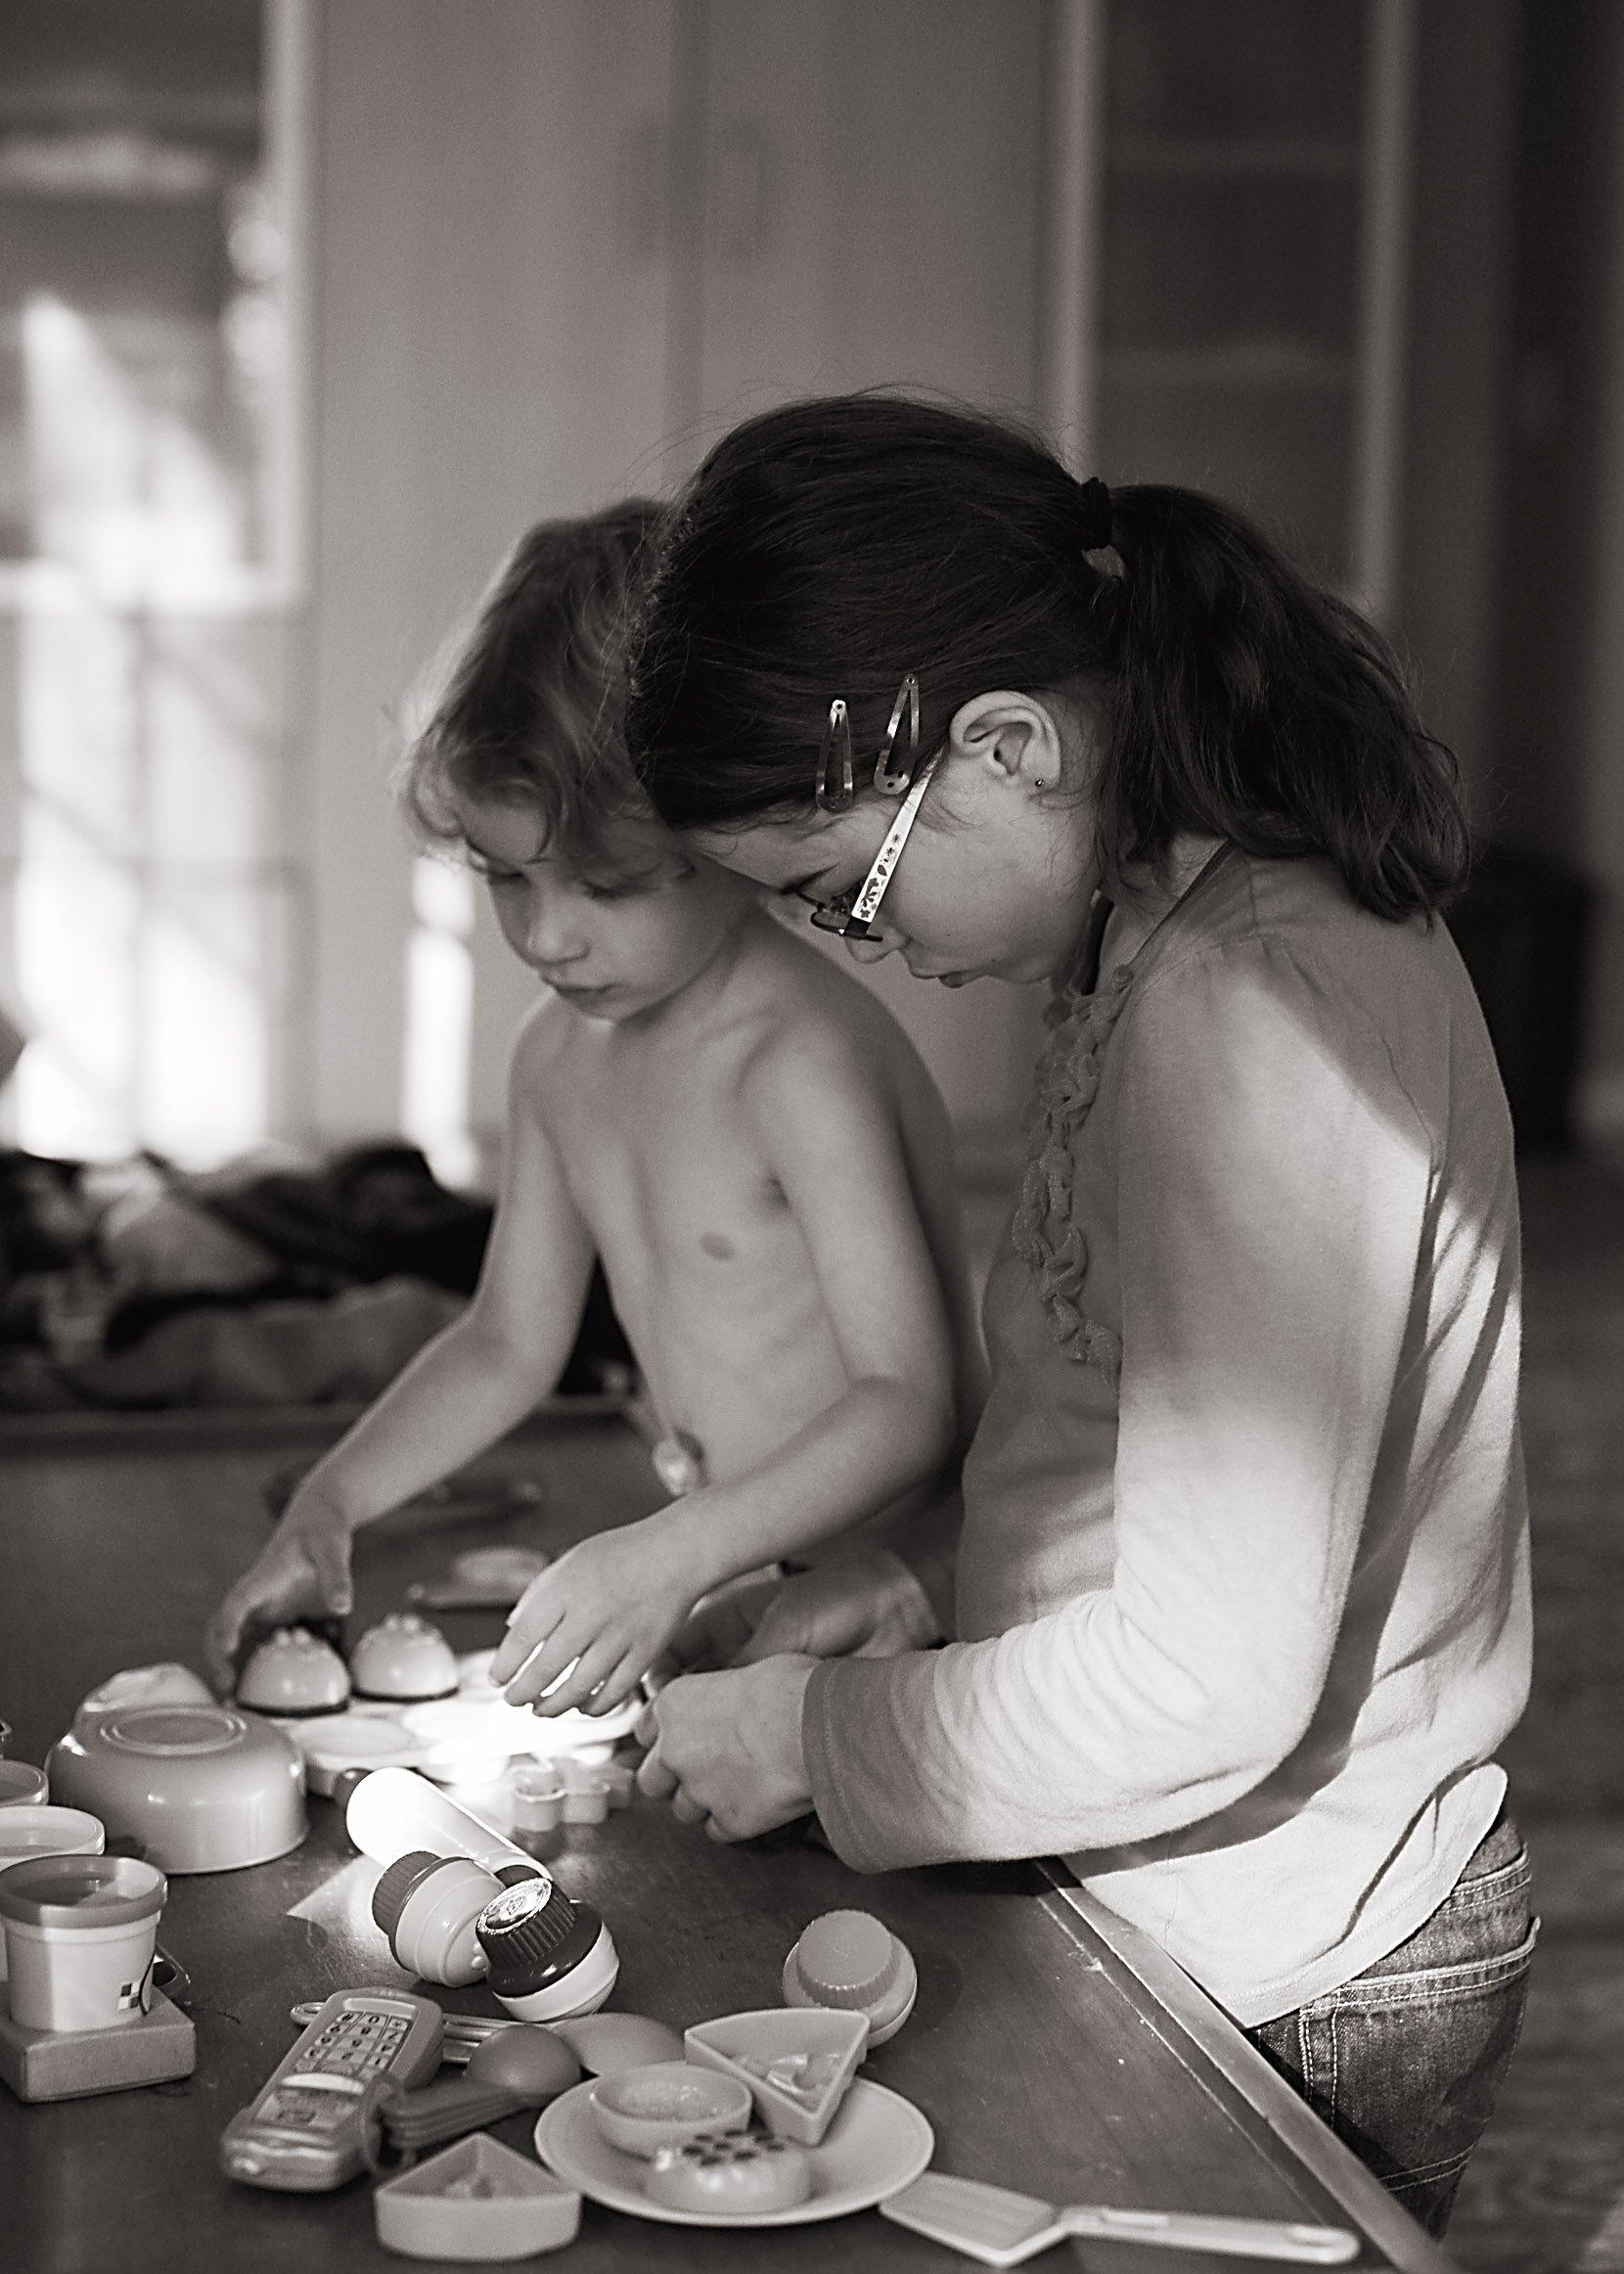 large family, large family blog, homeschool, homeschool blog, meal plans, large family meal plans